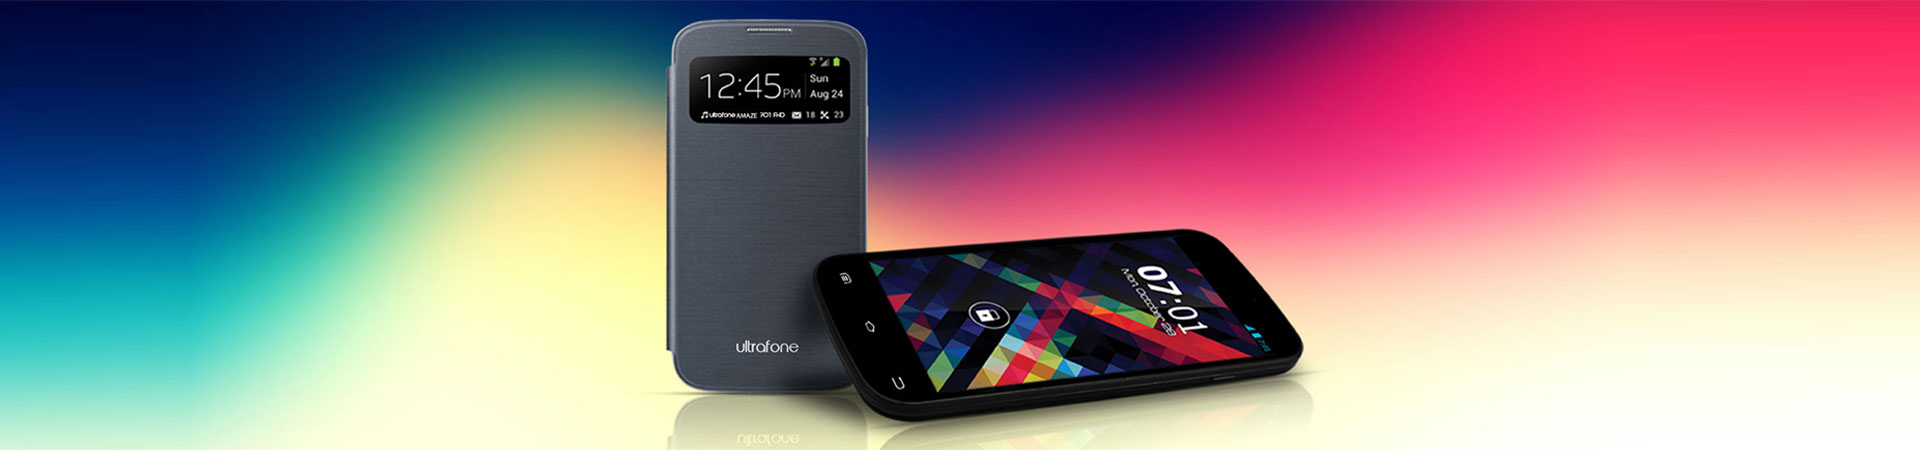 Zen Mobile 701 FHD Launch